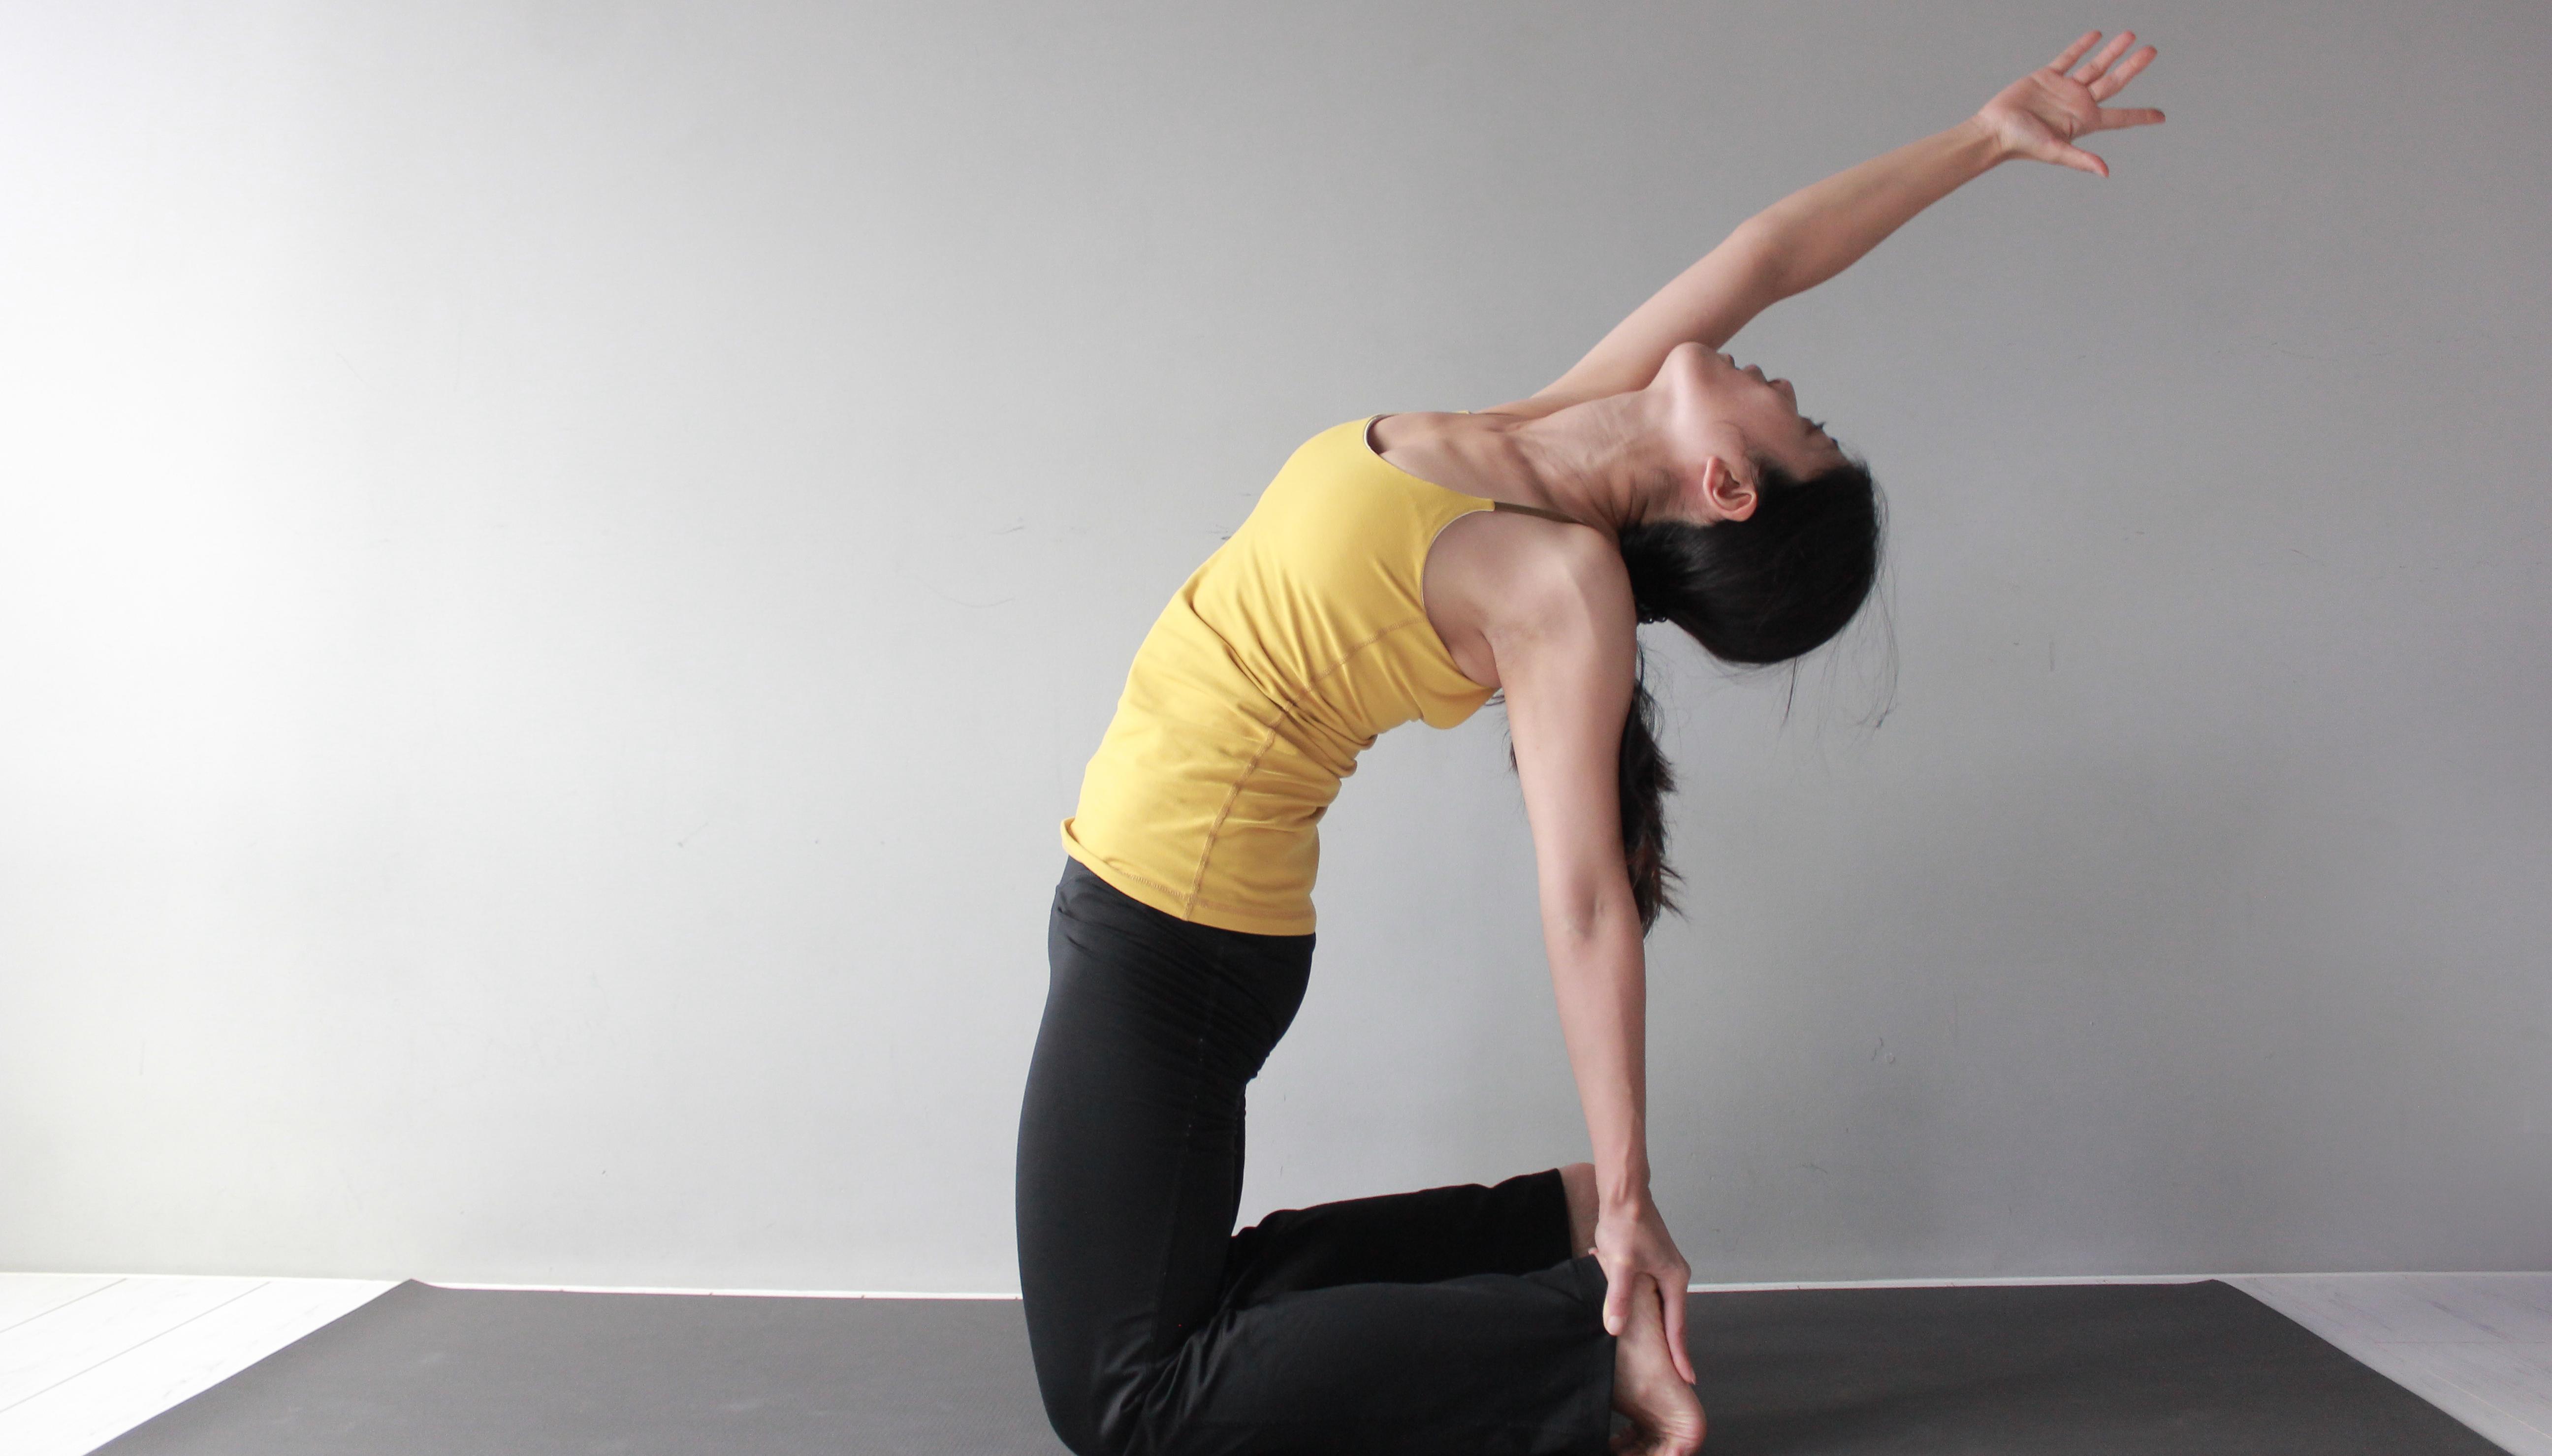 Yoga Teacher – Phoebe<br /><p>學生時期的我,繁忙的課業和對自我的要求,造成了我容易緊張焦慮的個性。朋友們總提醒我要多放鬆,而當時的我用一個理性的腦袋想:放鬆就是不要用力,理應是很簡單的,怎麼我做不到呢?然而沒有親身體驗,也無法真正明白。</p>